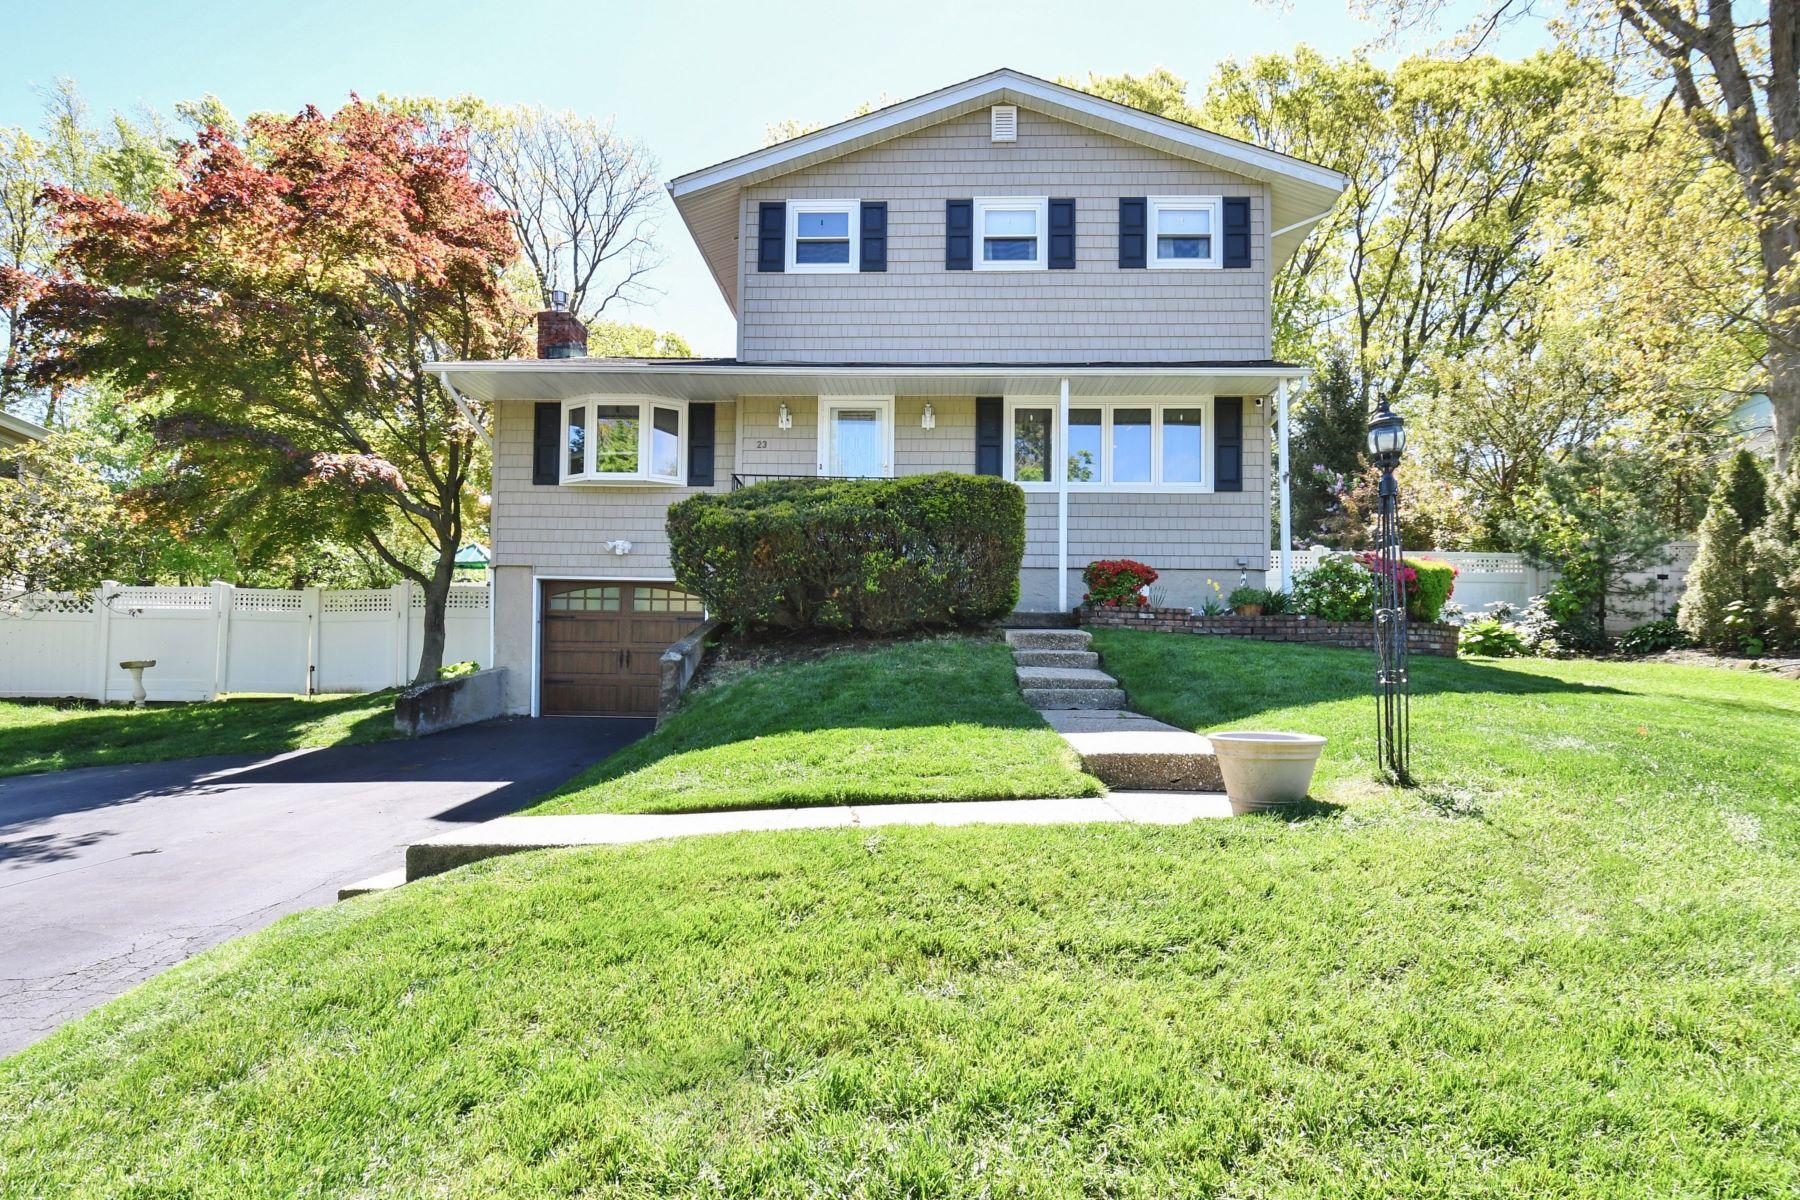 Single Family Homes for Sale at Kings Park 23 Ravenwood Dr Kings Park, New York 11754 United States